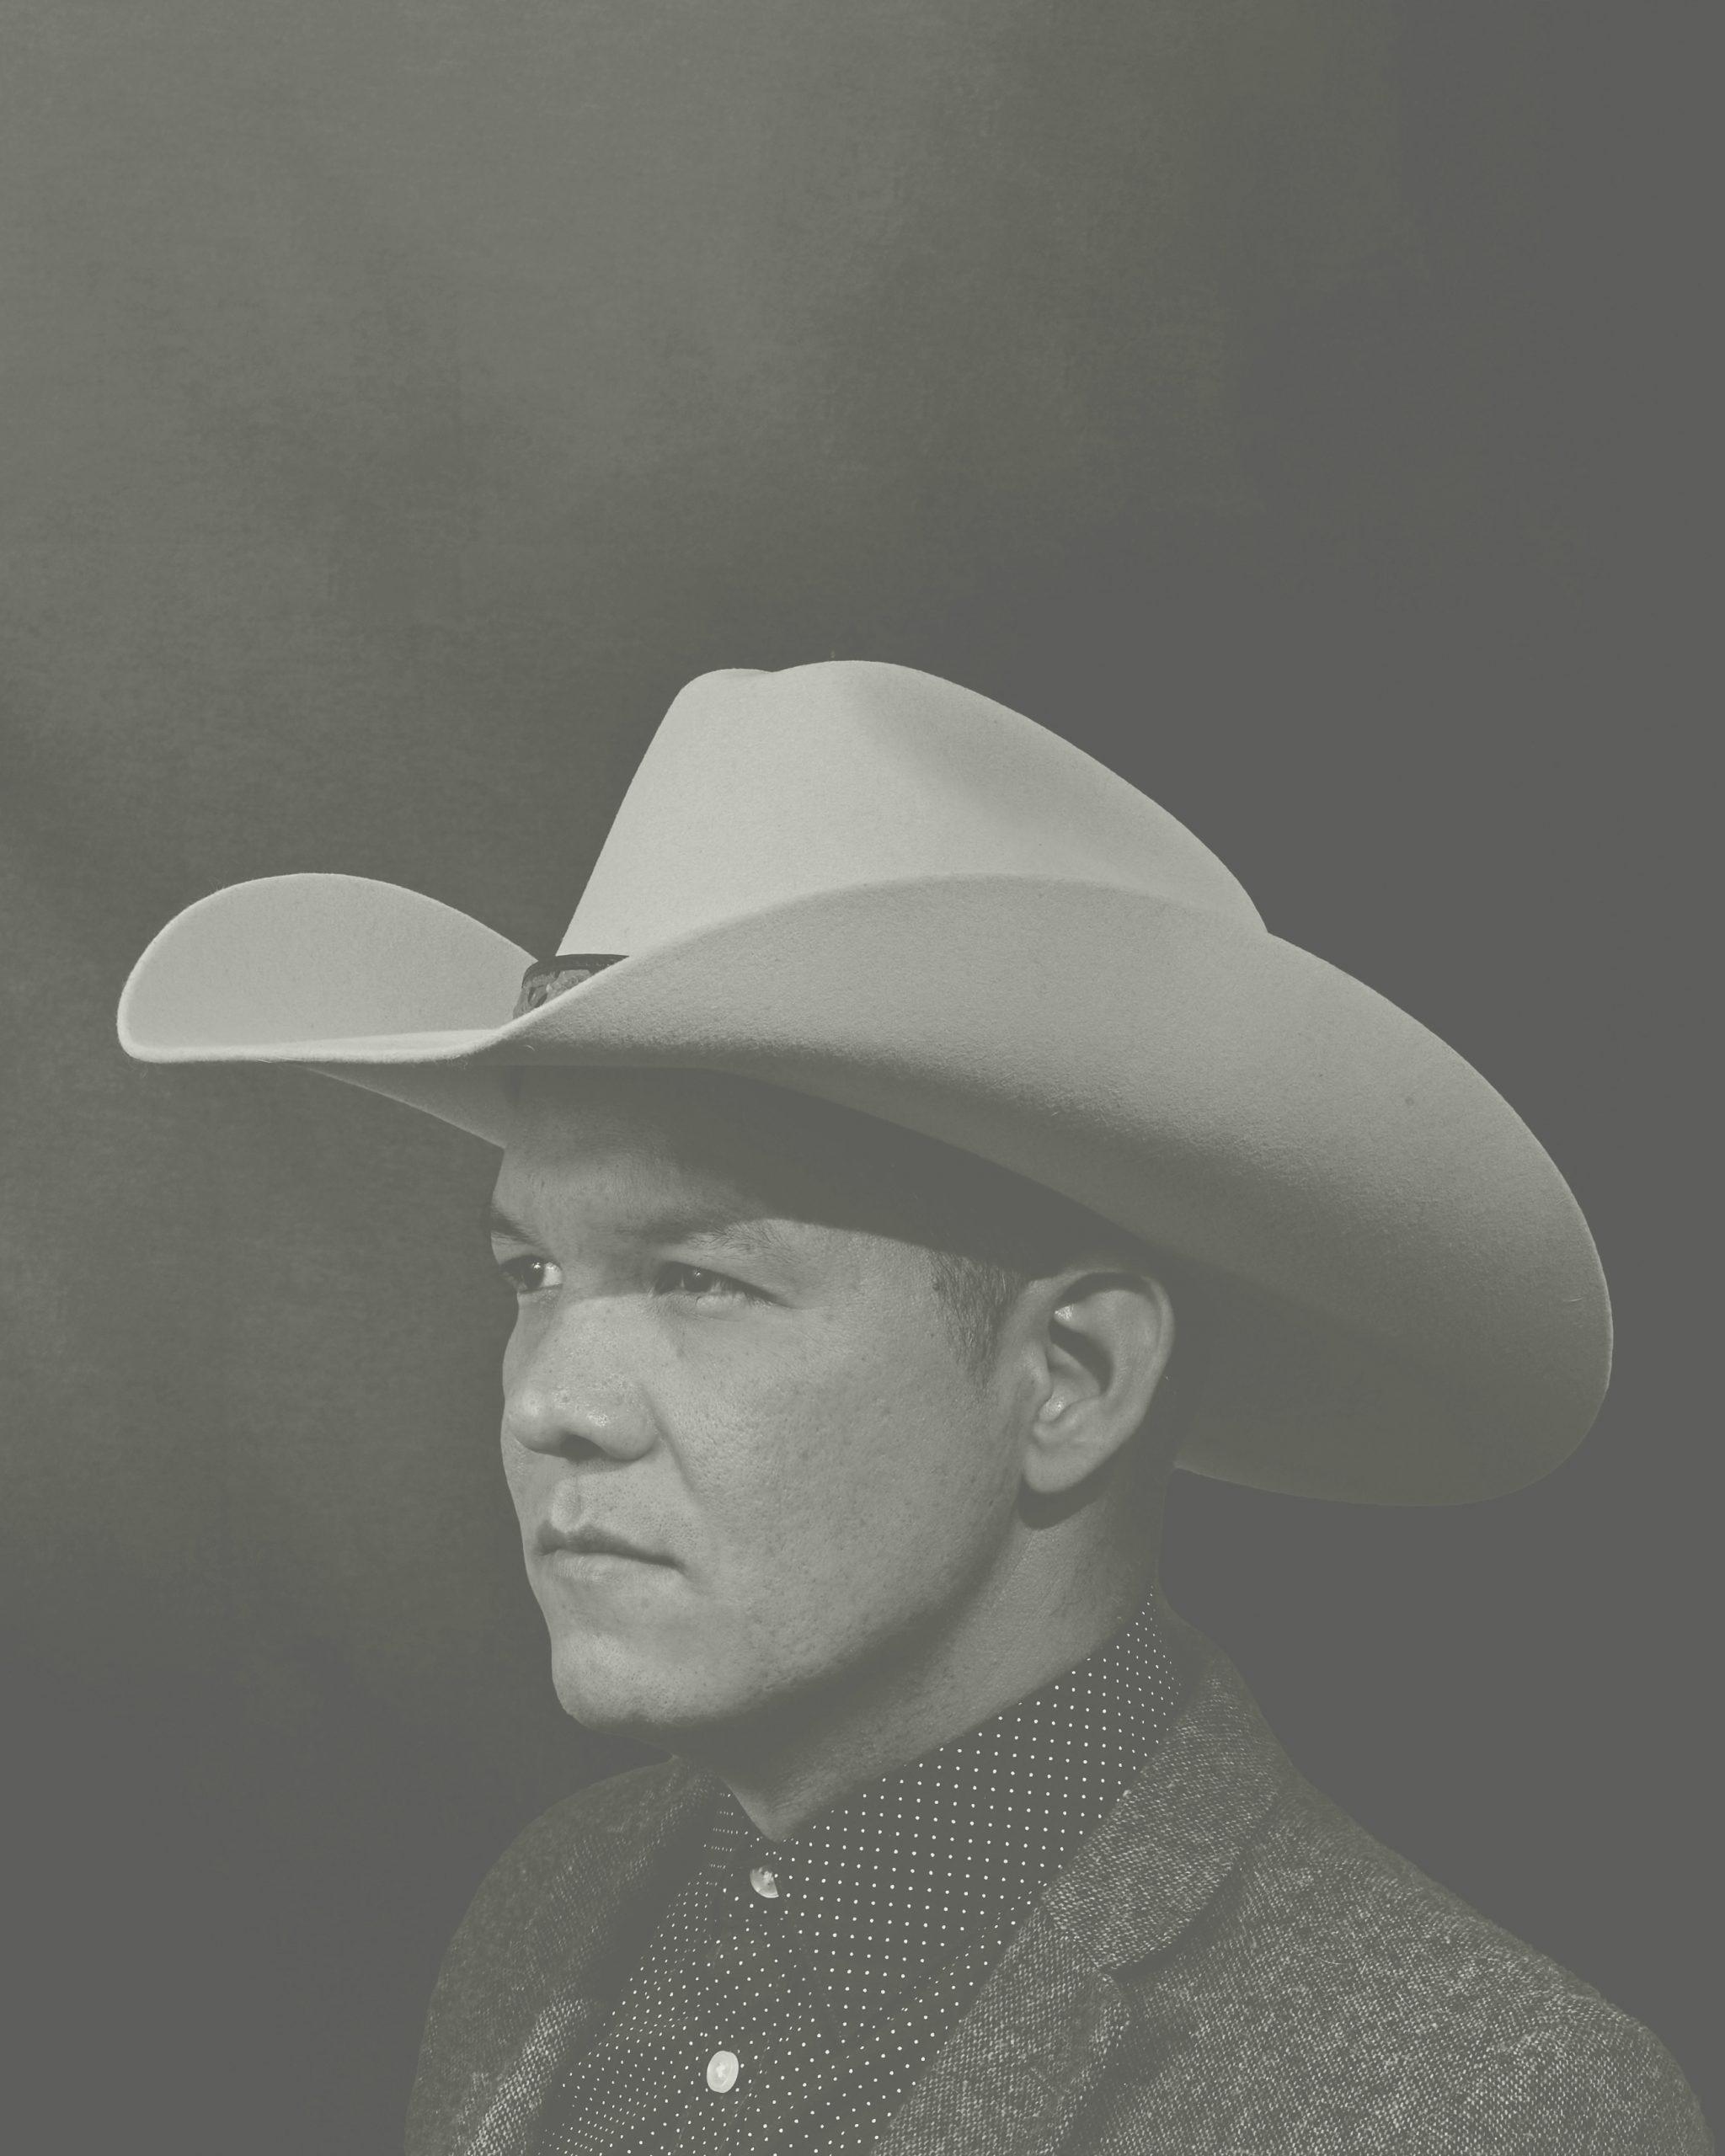 Caleb_Santiago_Alvarado-Portrait-1